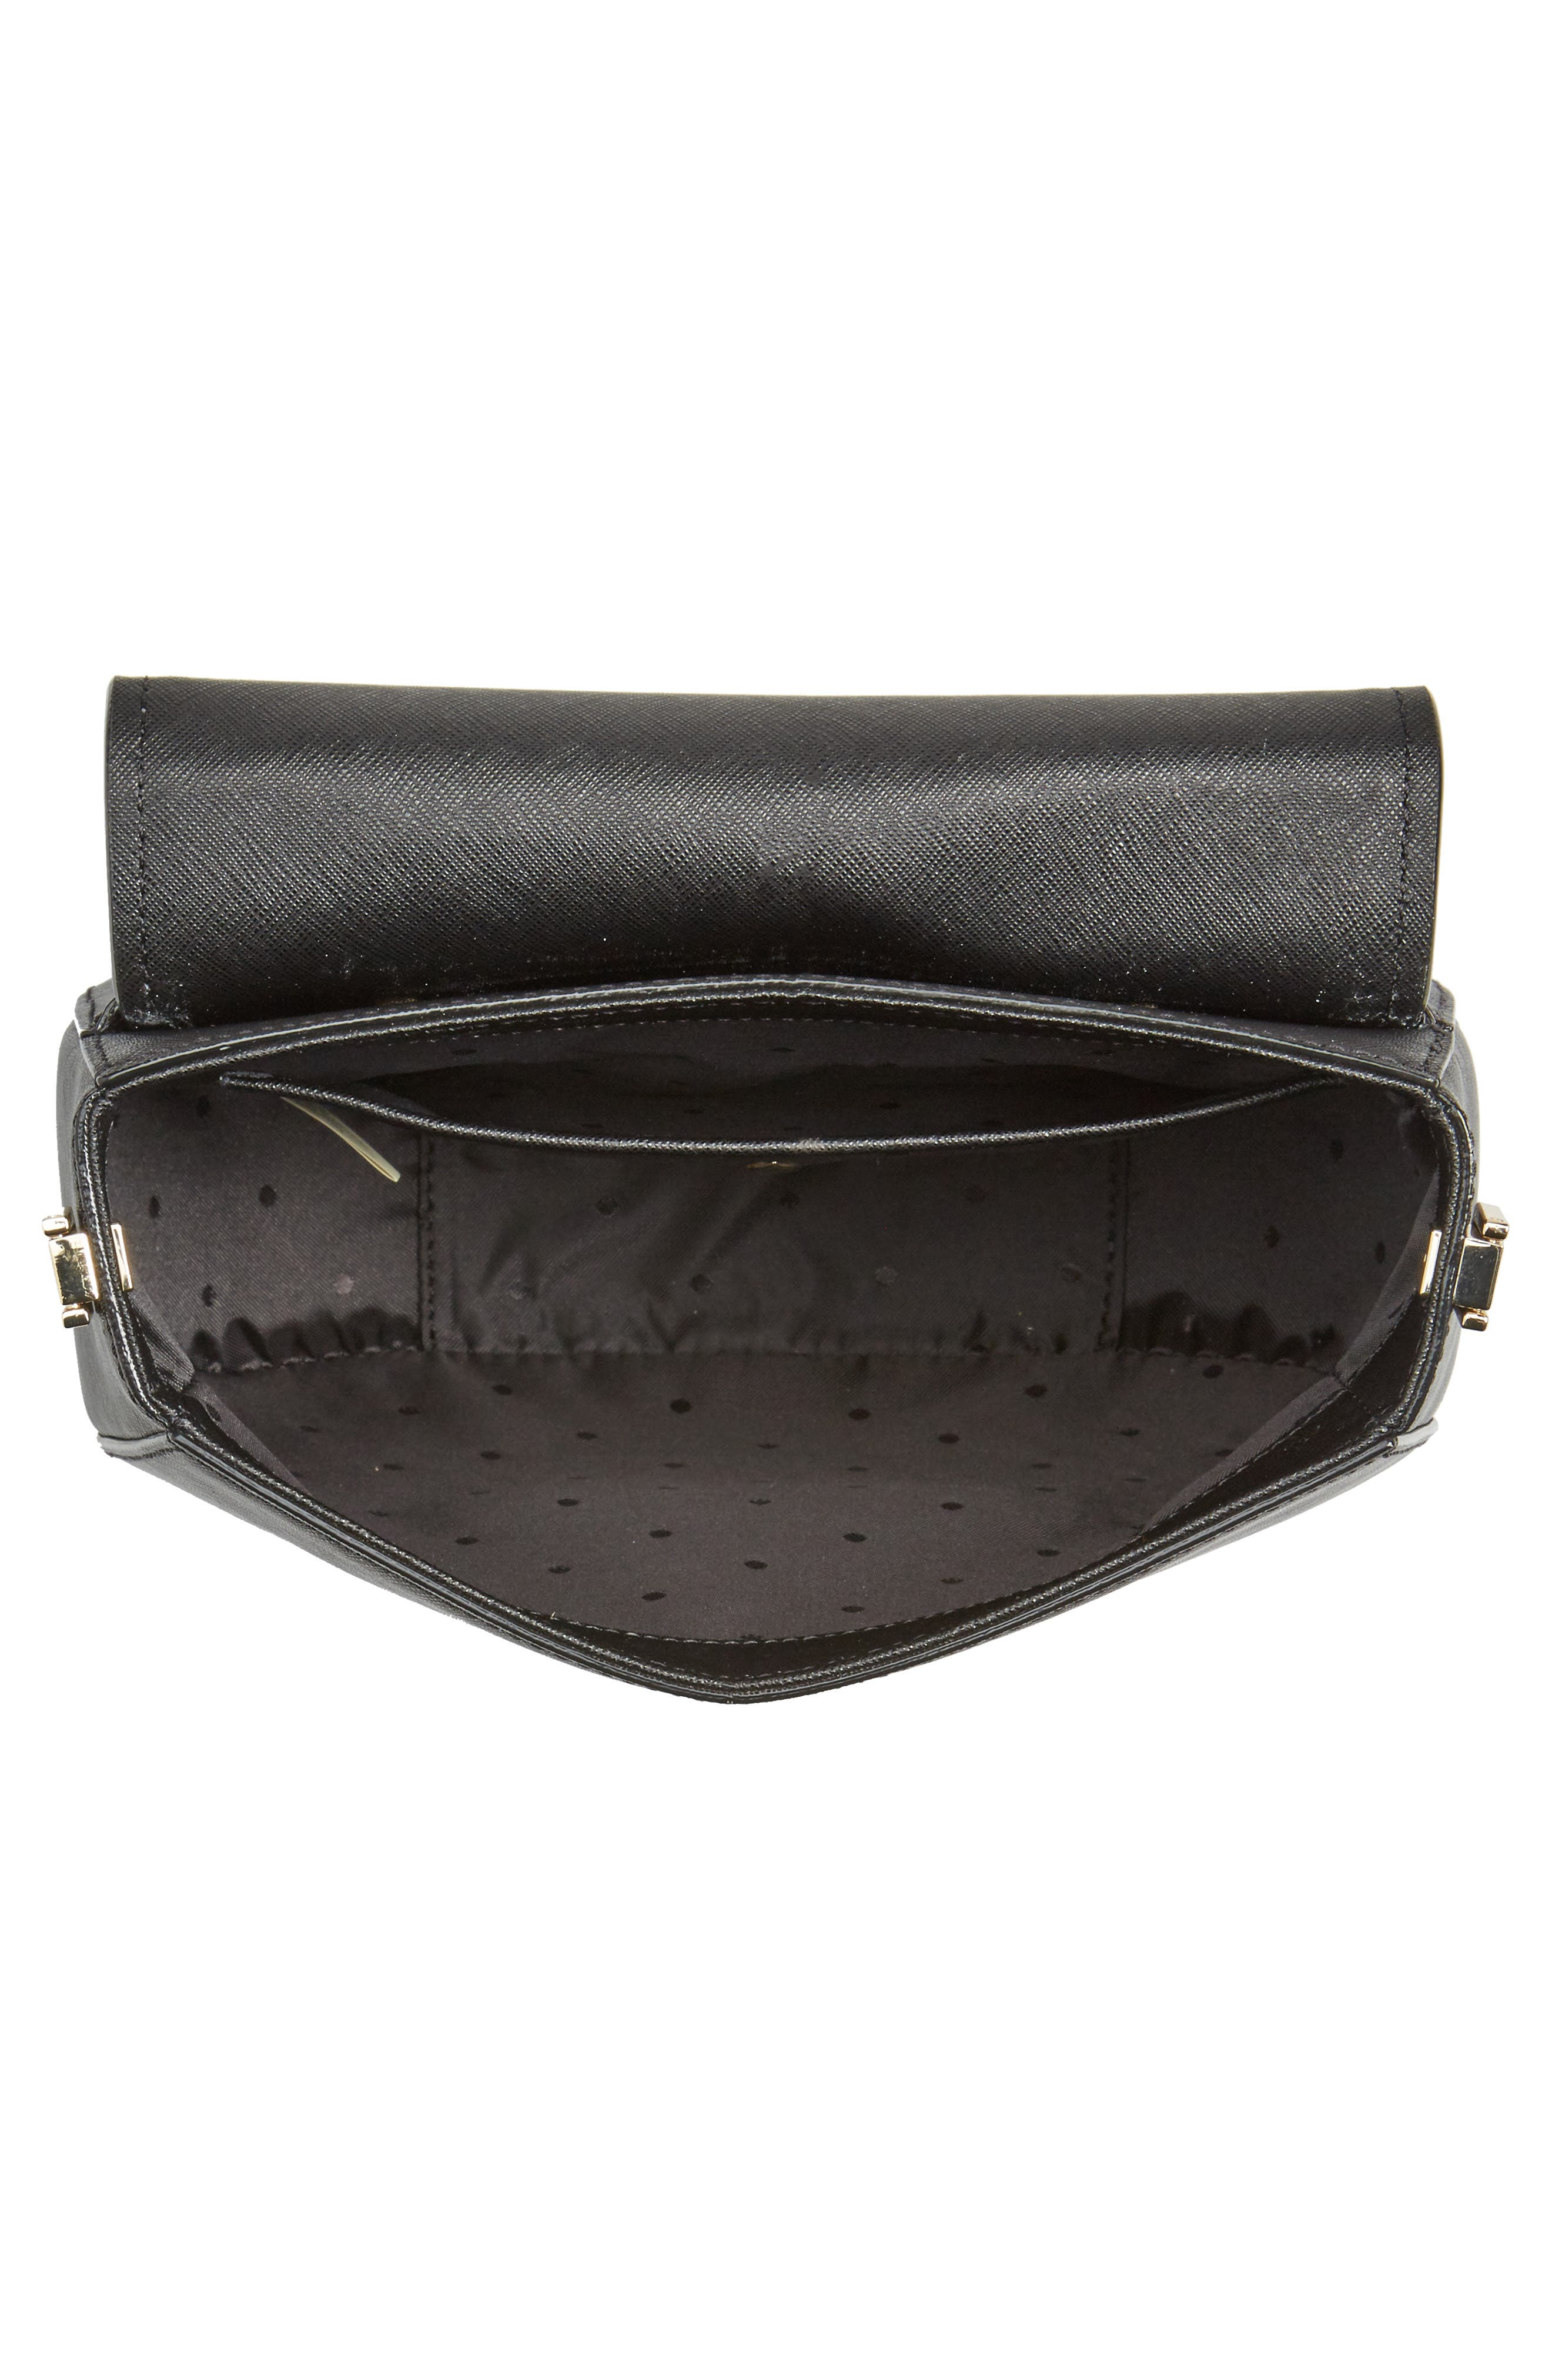 make it mine - byrdie leather saddle bag,                             Alternate thumbnail 3, color,                             Black